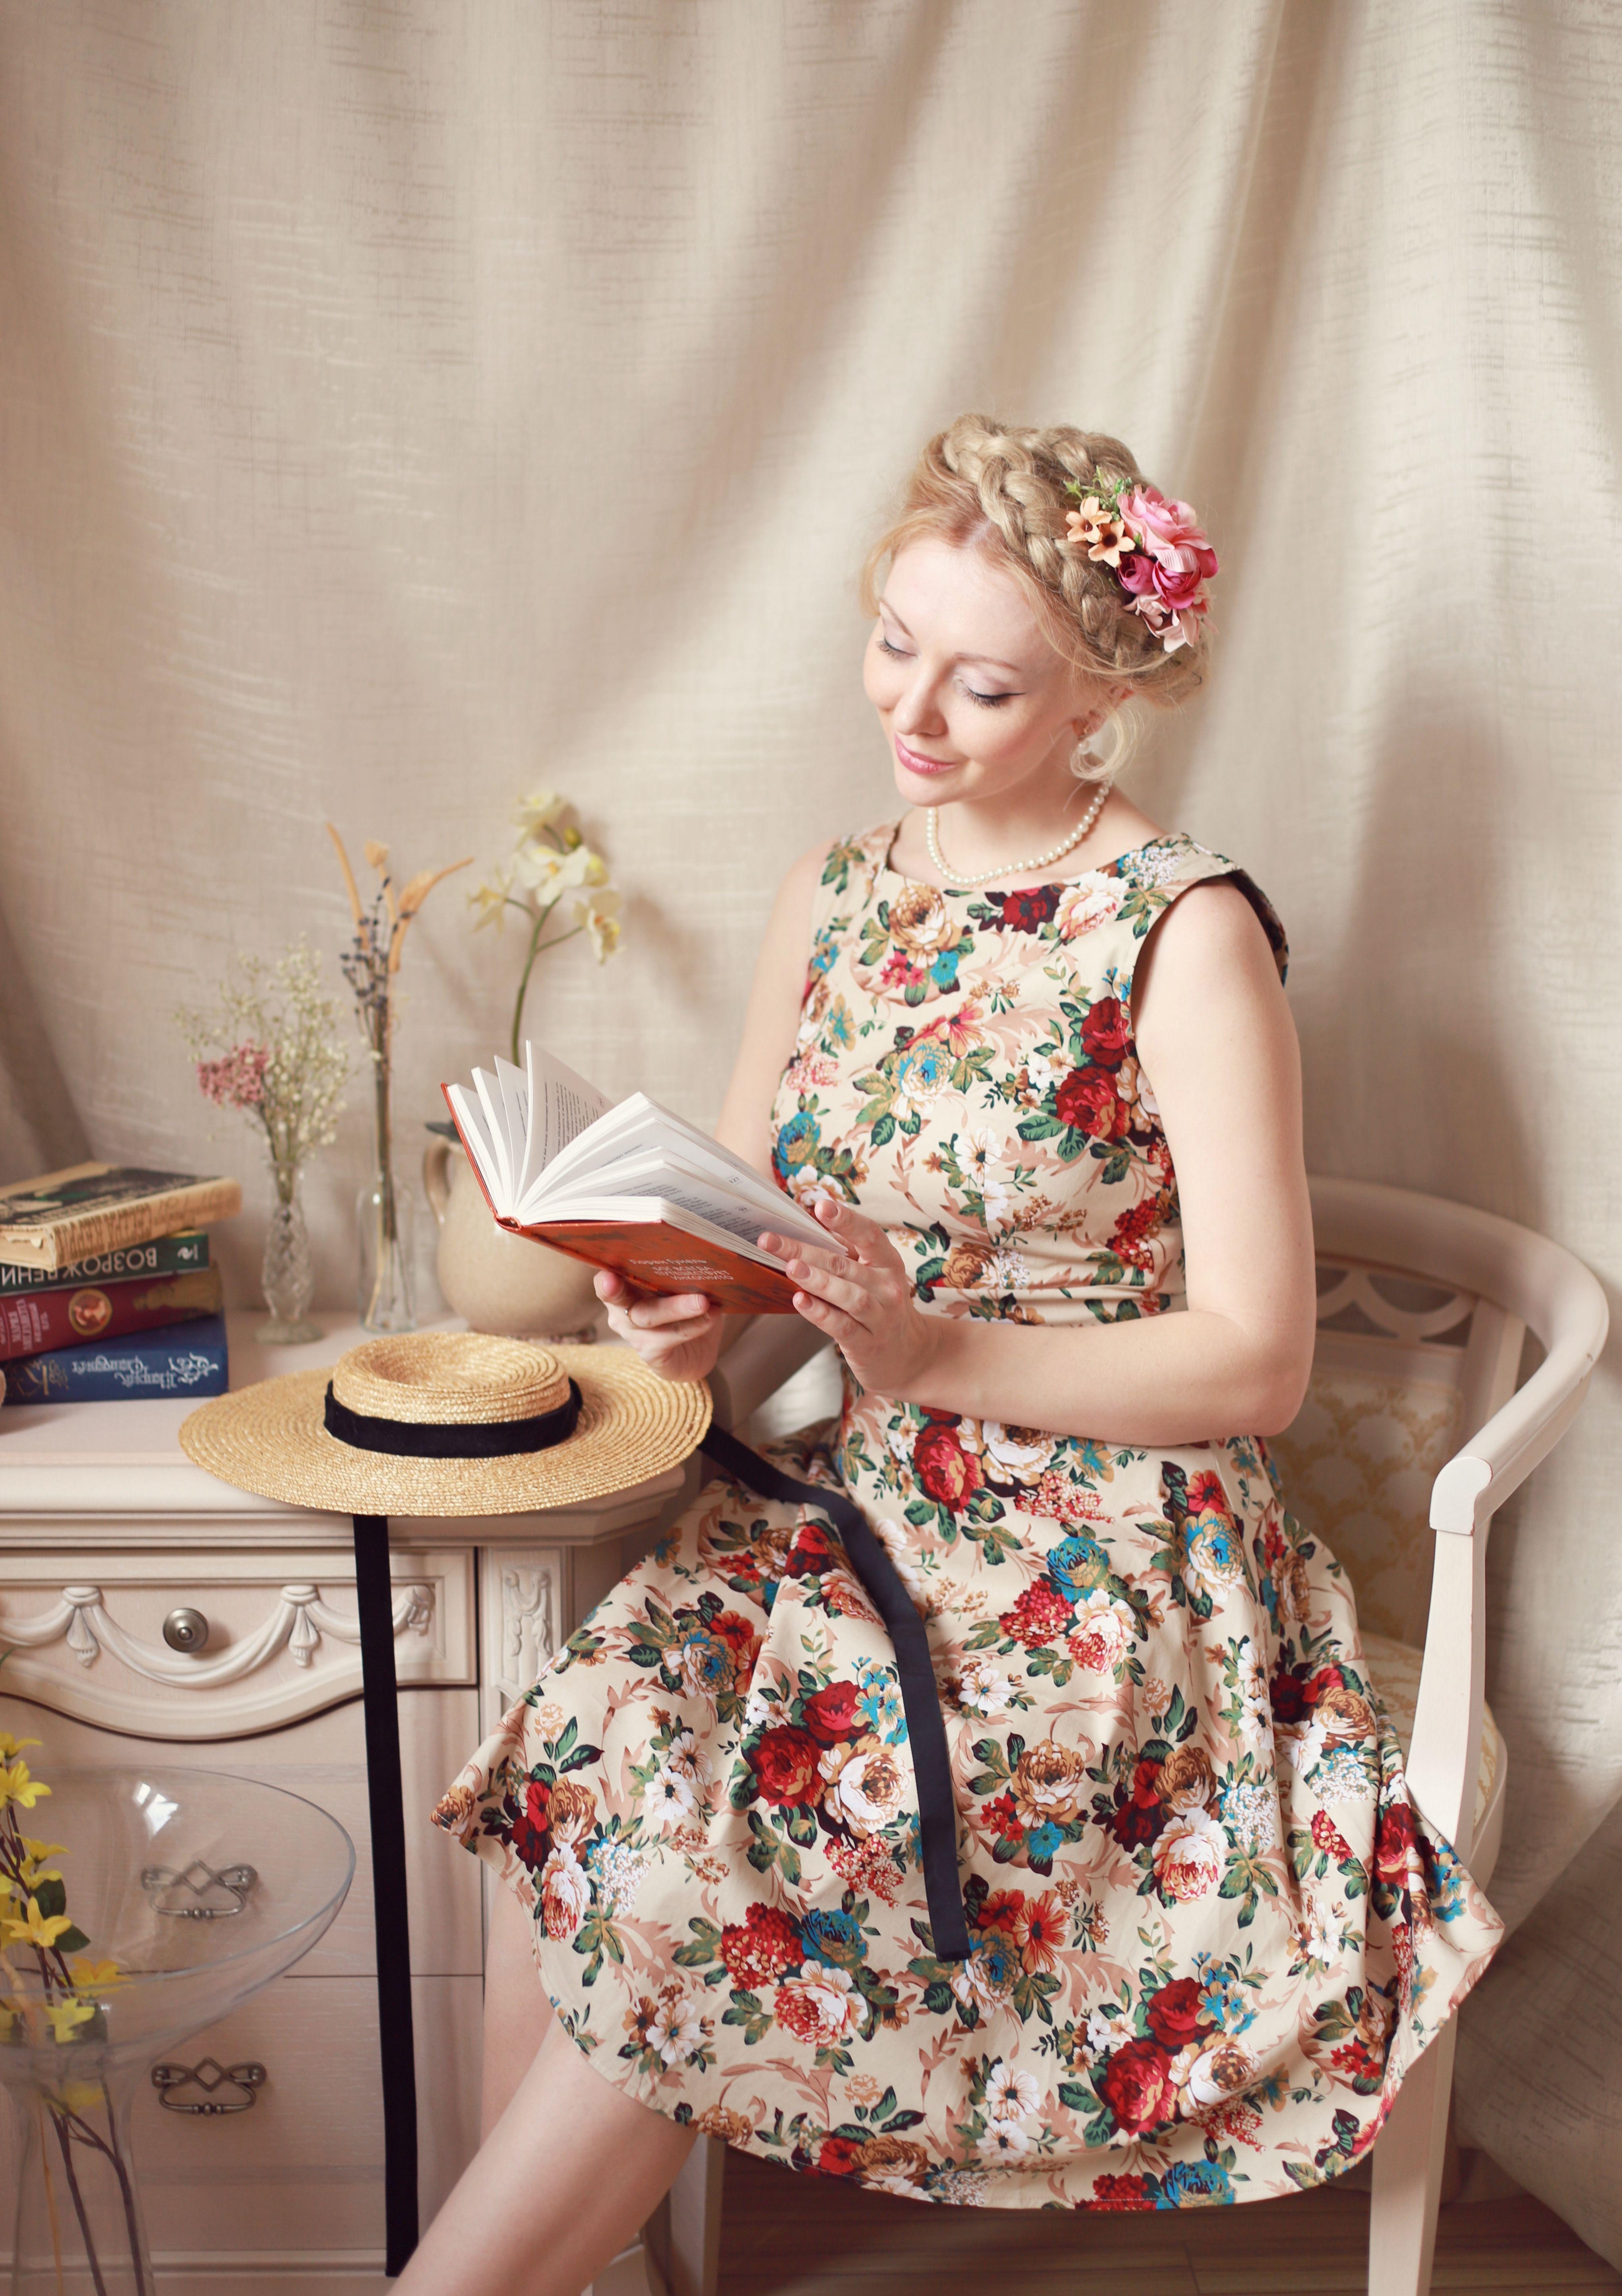 Floral Print Self Tie Sleeveless Vintage Dress Vintage Tea Dress Tea Dress Party Dresses For Women [ 5779 x 4082 Pixel ]